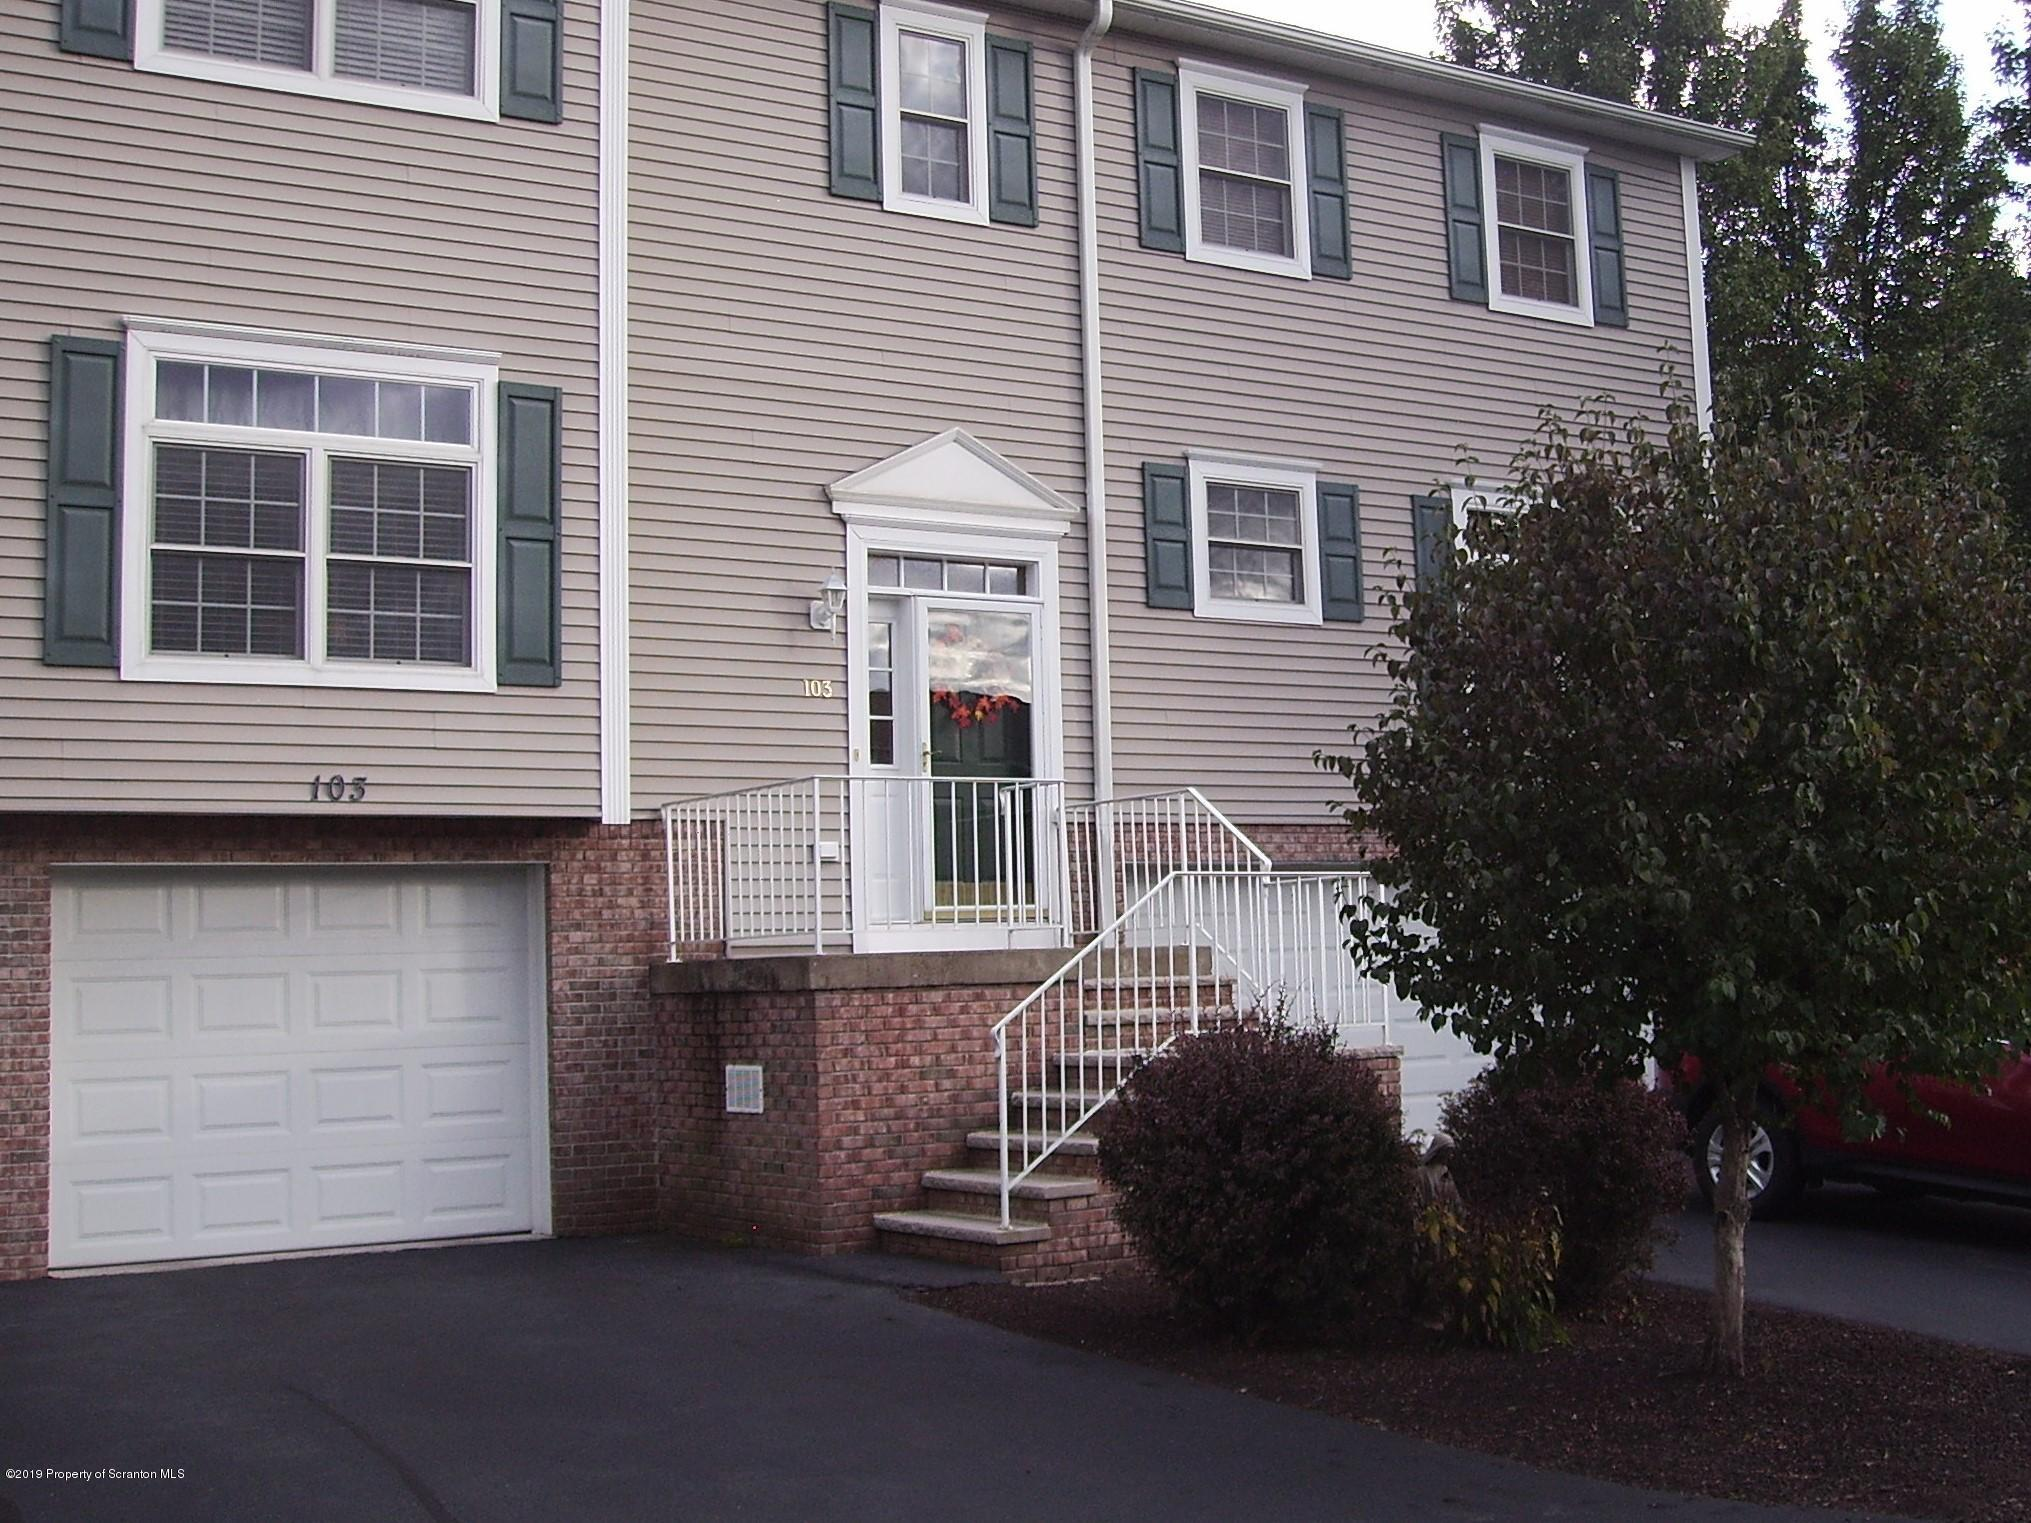 103 Parkland Dr, Clarks Summit, Pennsylvania 18411, 2 Bedrooms Bedrooms, 6 Rooms Rooms,2 BathroomsBathrooms,Residential - condo/townhome,For Sale,Parkland,19-4661